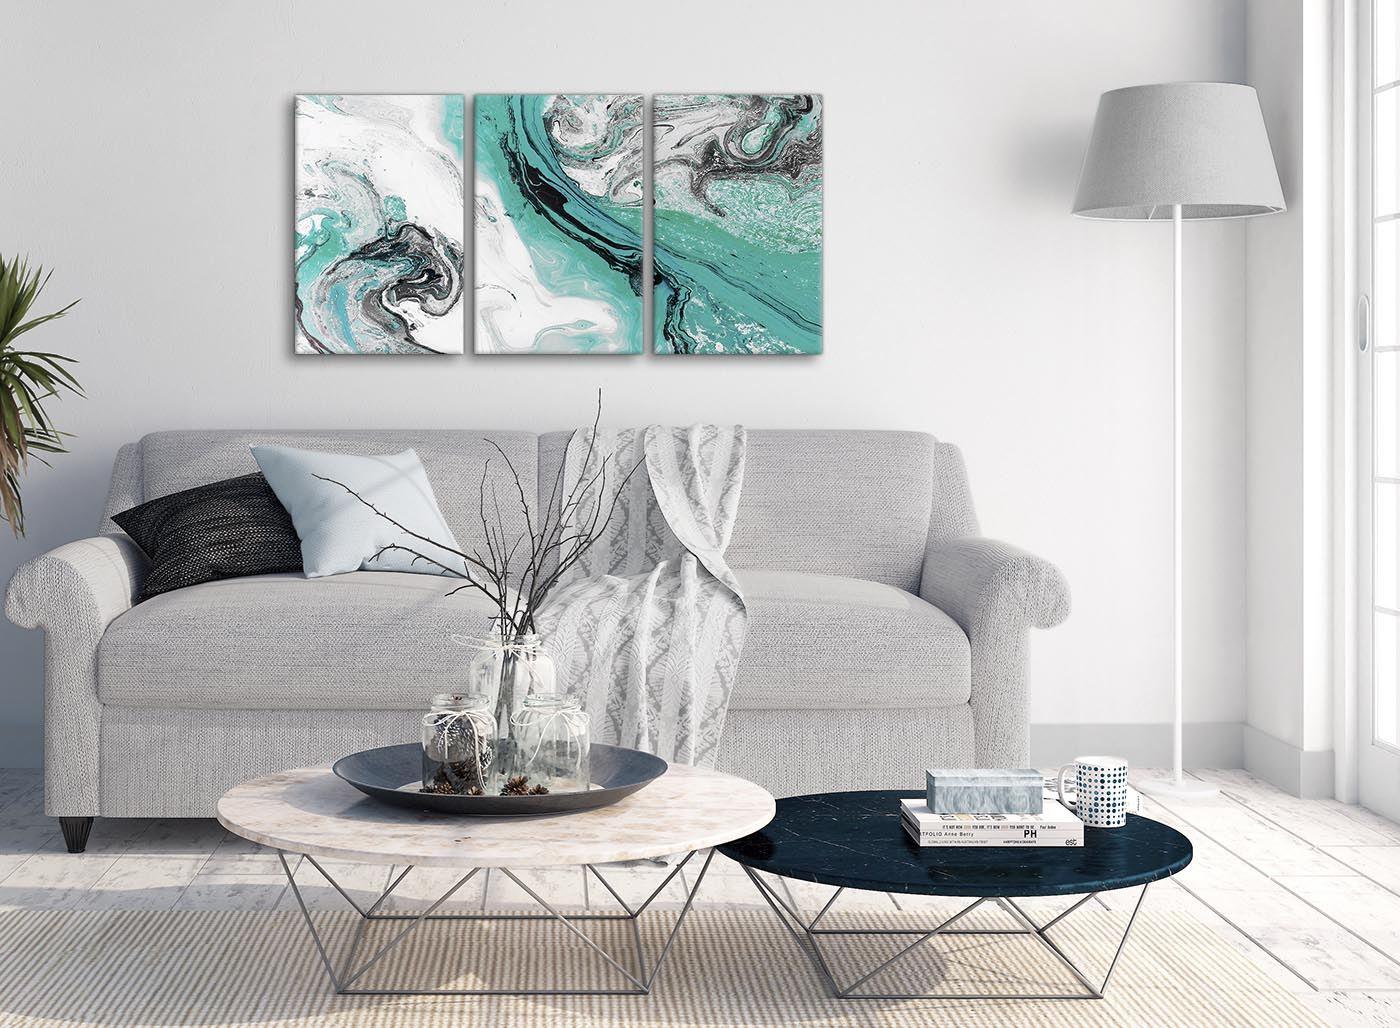 turquoise et gris tourbillon salon toile wall art abstract print maison tentures murales tapis alfa bau gmbh de